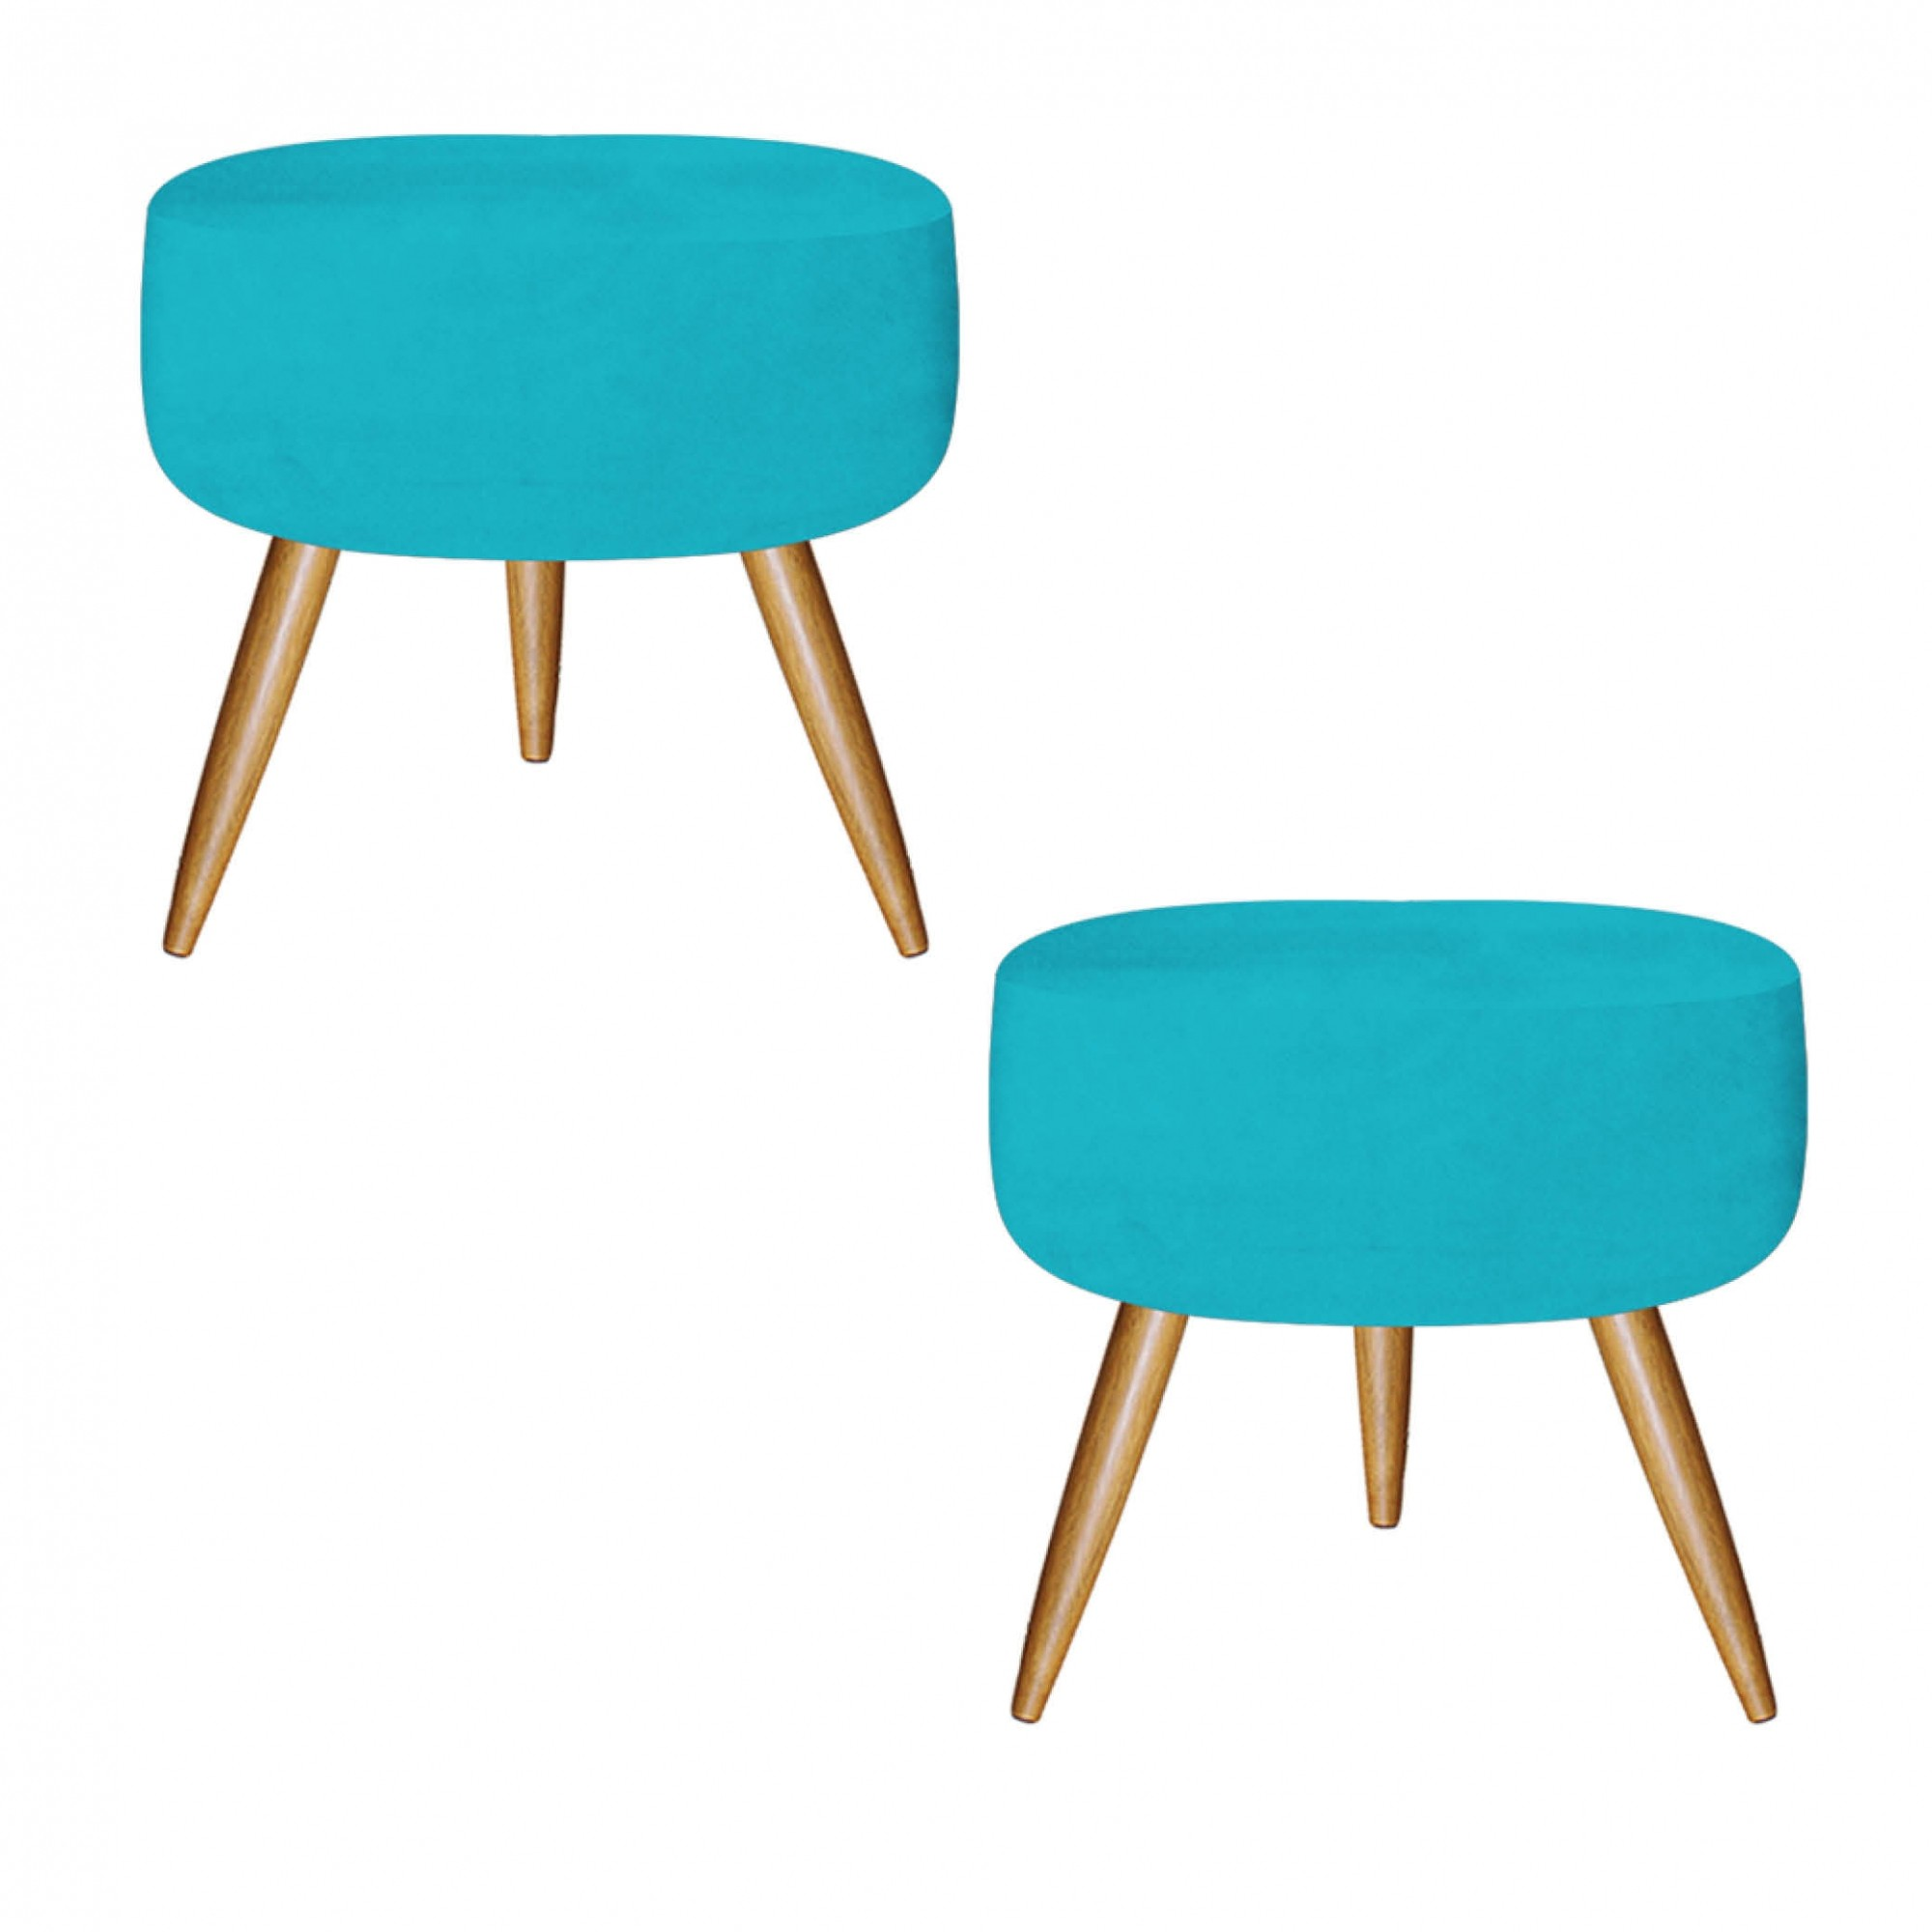 Kit 02 Puff Decorativo Redondo Suede Azul Turquesa - Bela Casa Shop